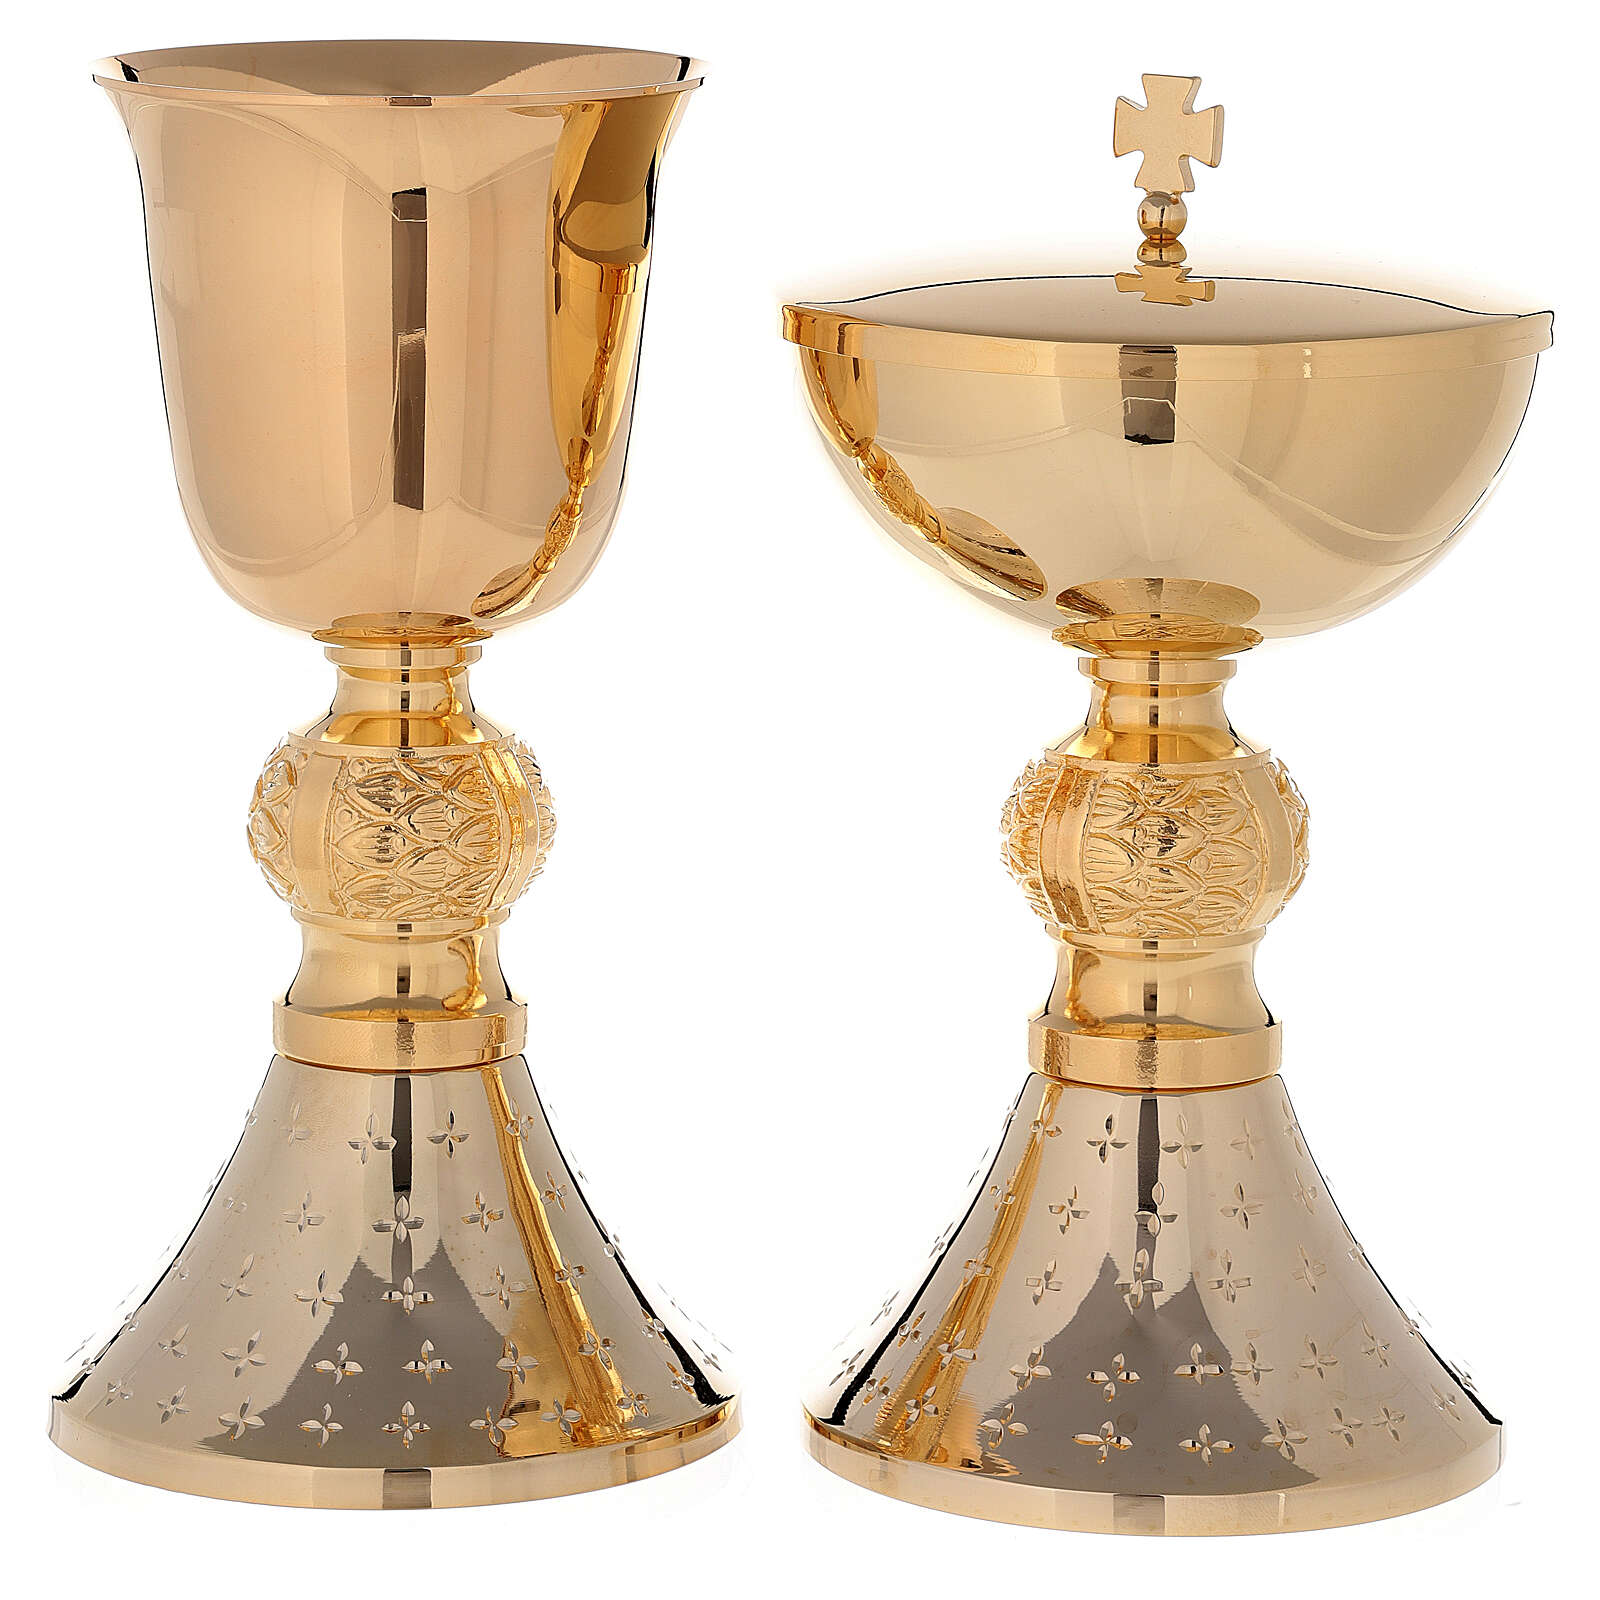 Chalice and ciborium 24-karat gold plated brass with diamond finished base 4